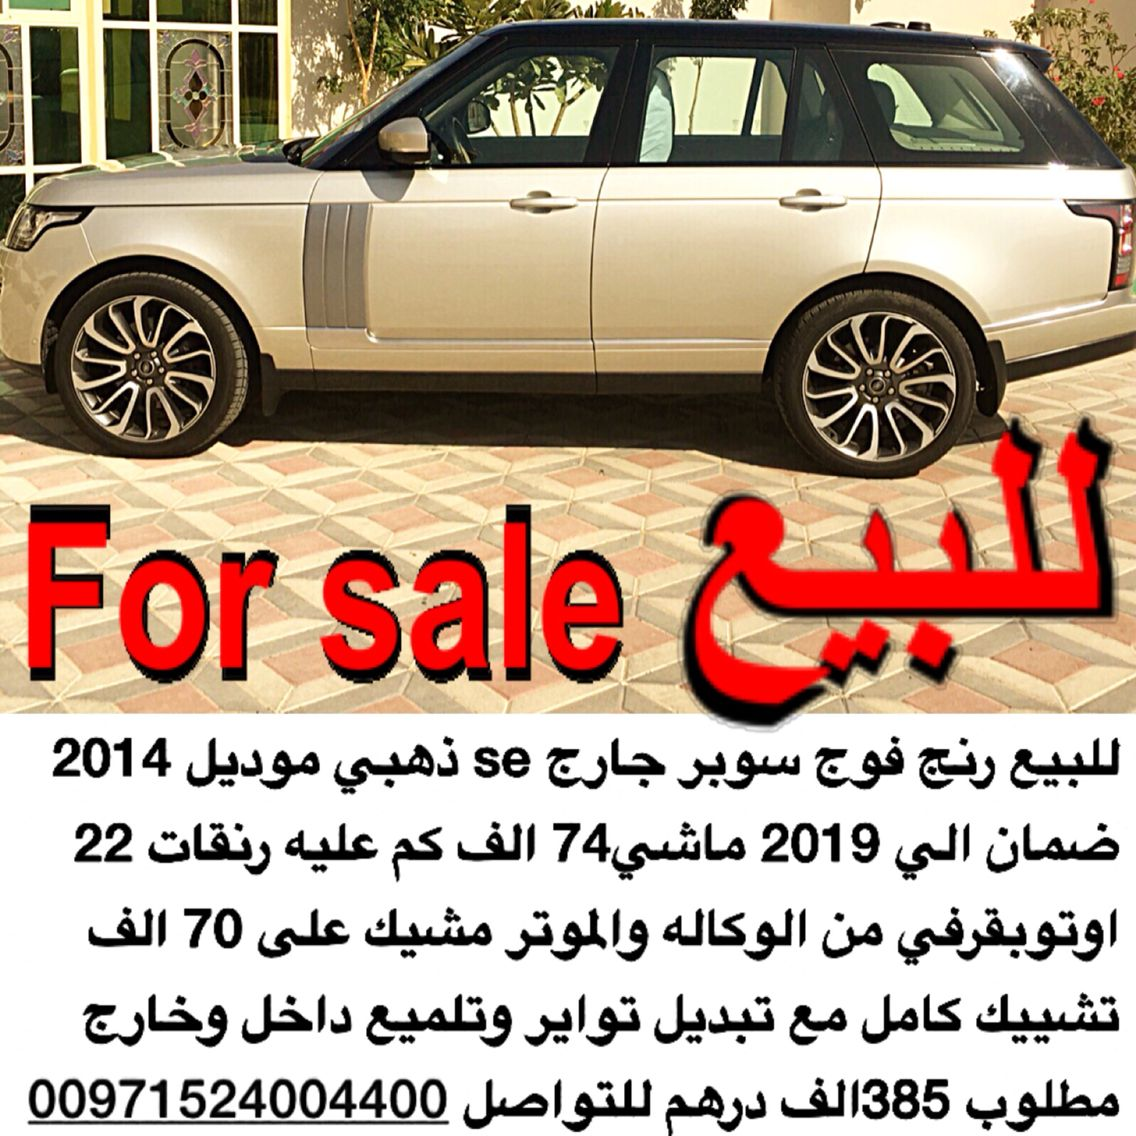 Pin On سوق الامارات للسيارات اعلانات بيع وطلب المركبات